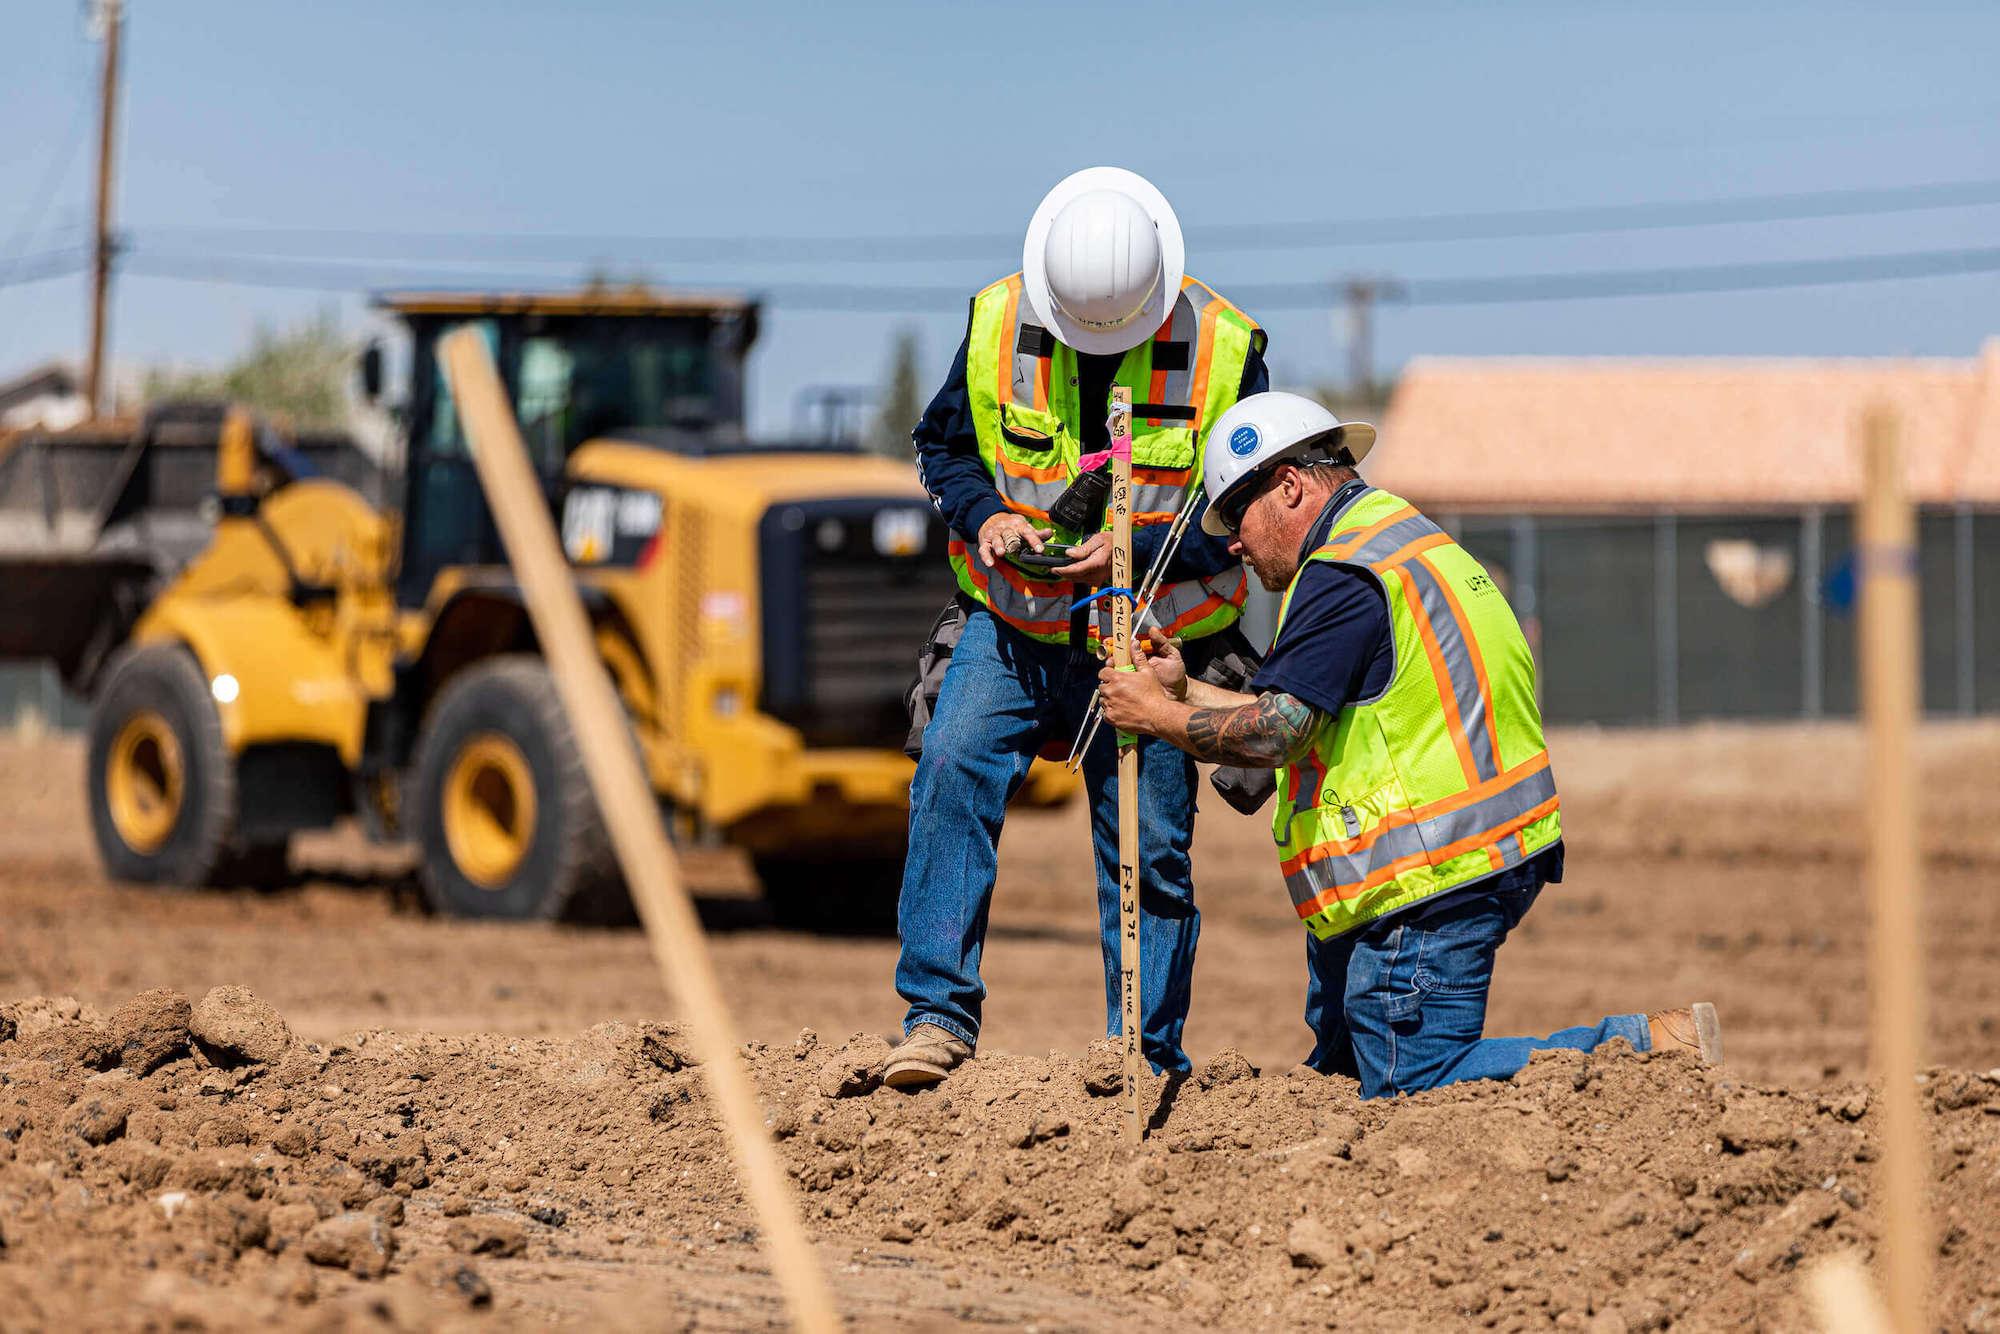 Uprite-Construction-Commercial-Photography-Copyright-DORIAN-MEDIA1